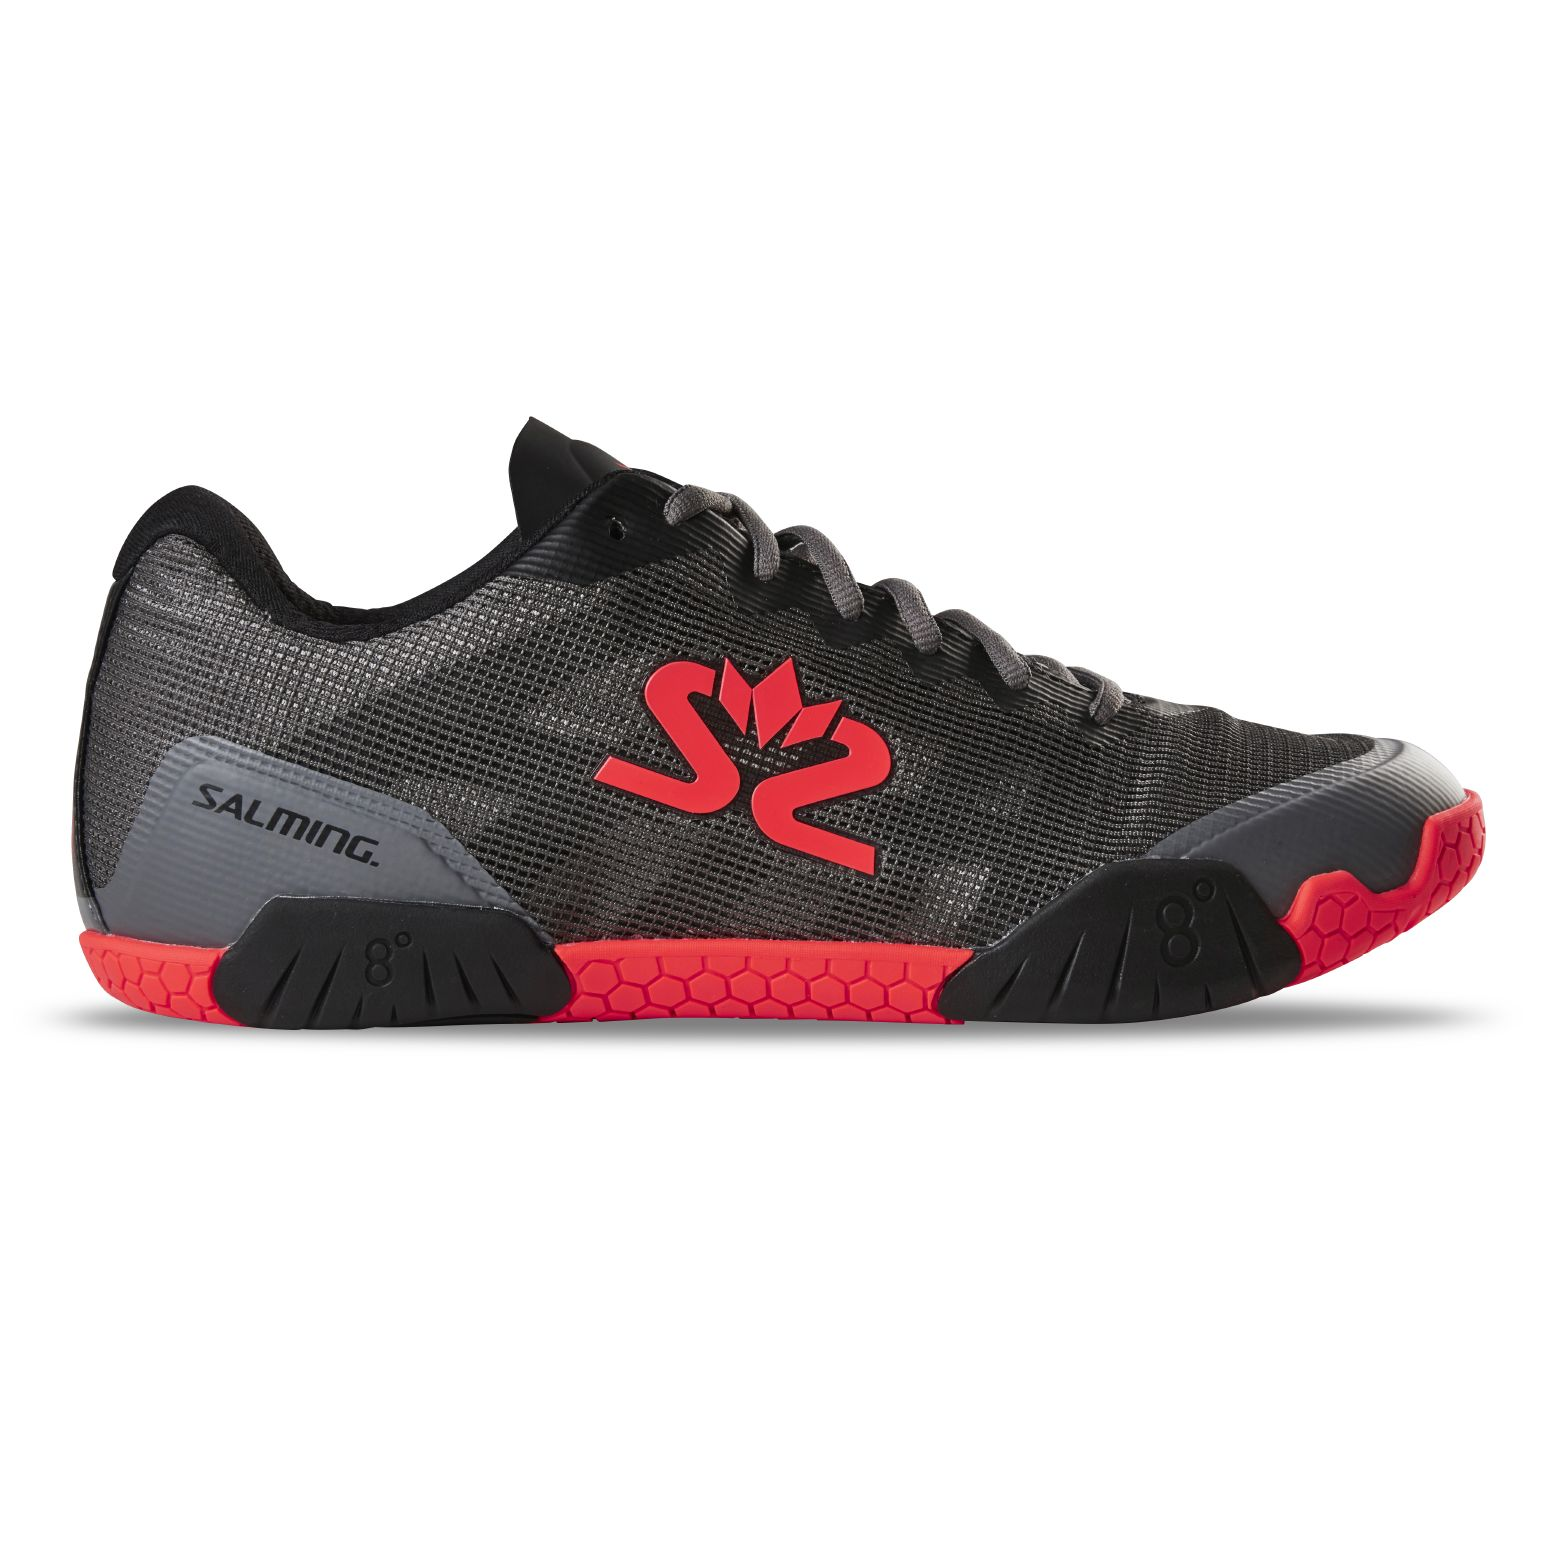 Salming Hawk Shoe Men GunMetal/Red 10 UK - 45 1/3 EUR - 29 cm